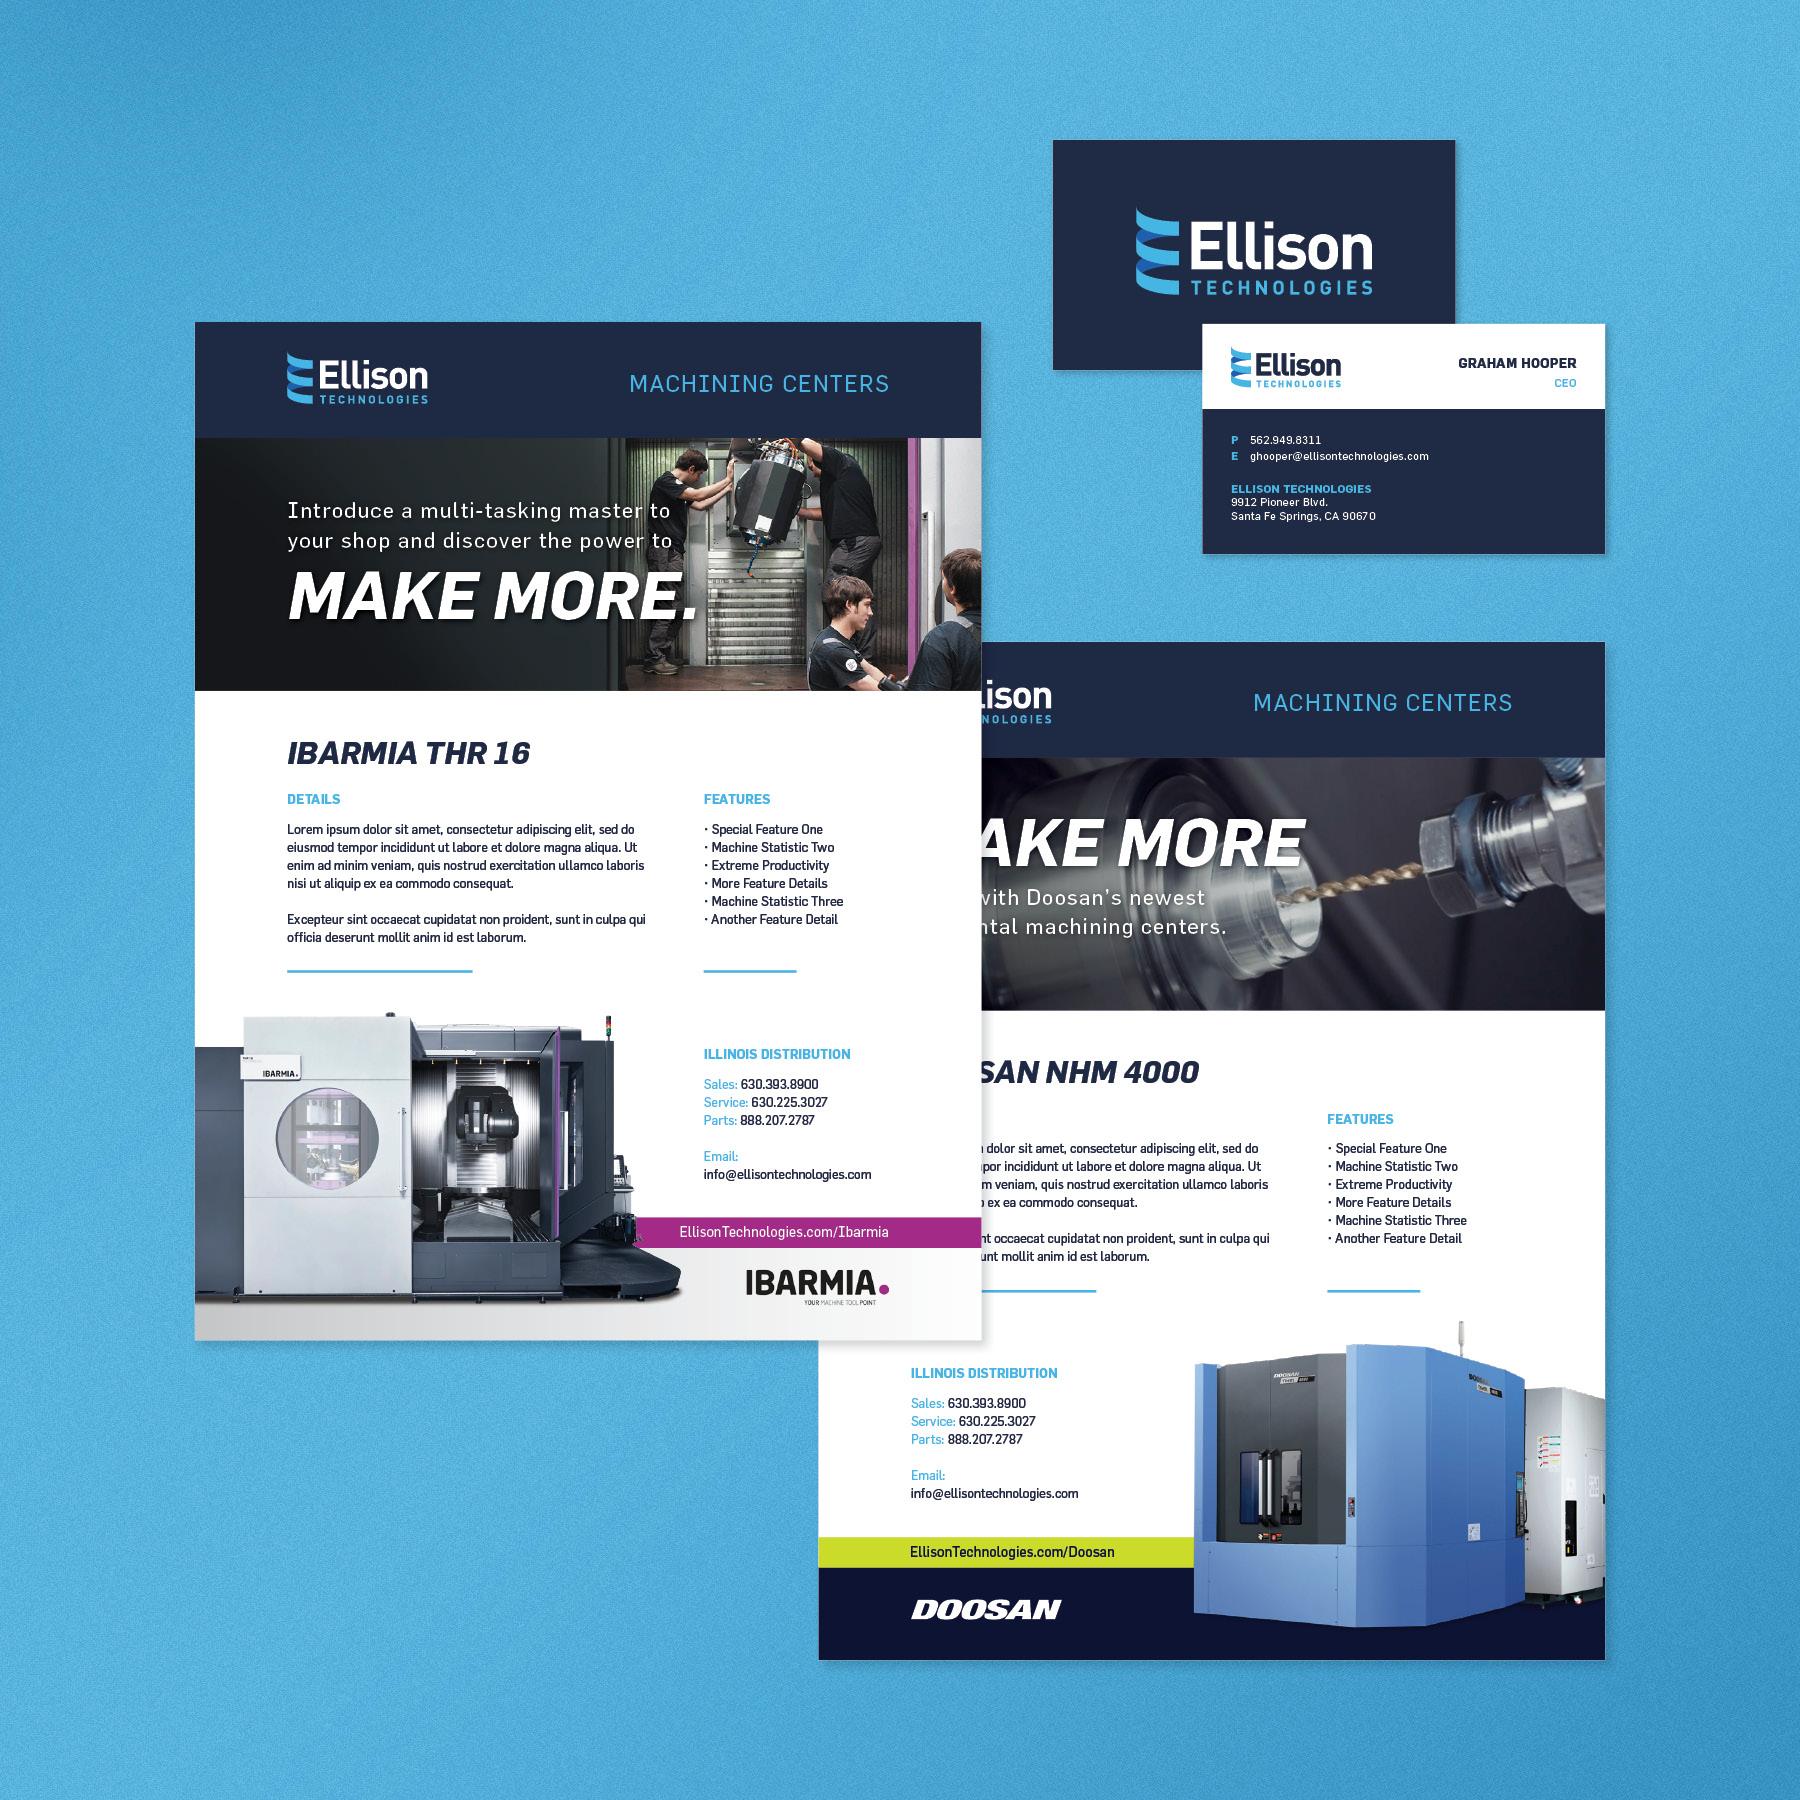 ellison-collateral-portfolio.jpg